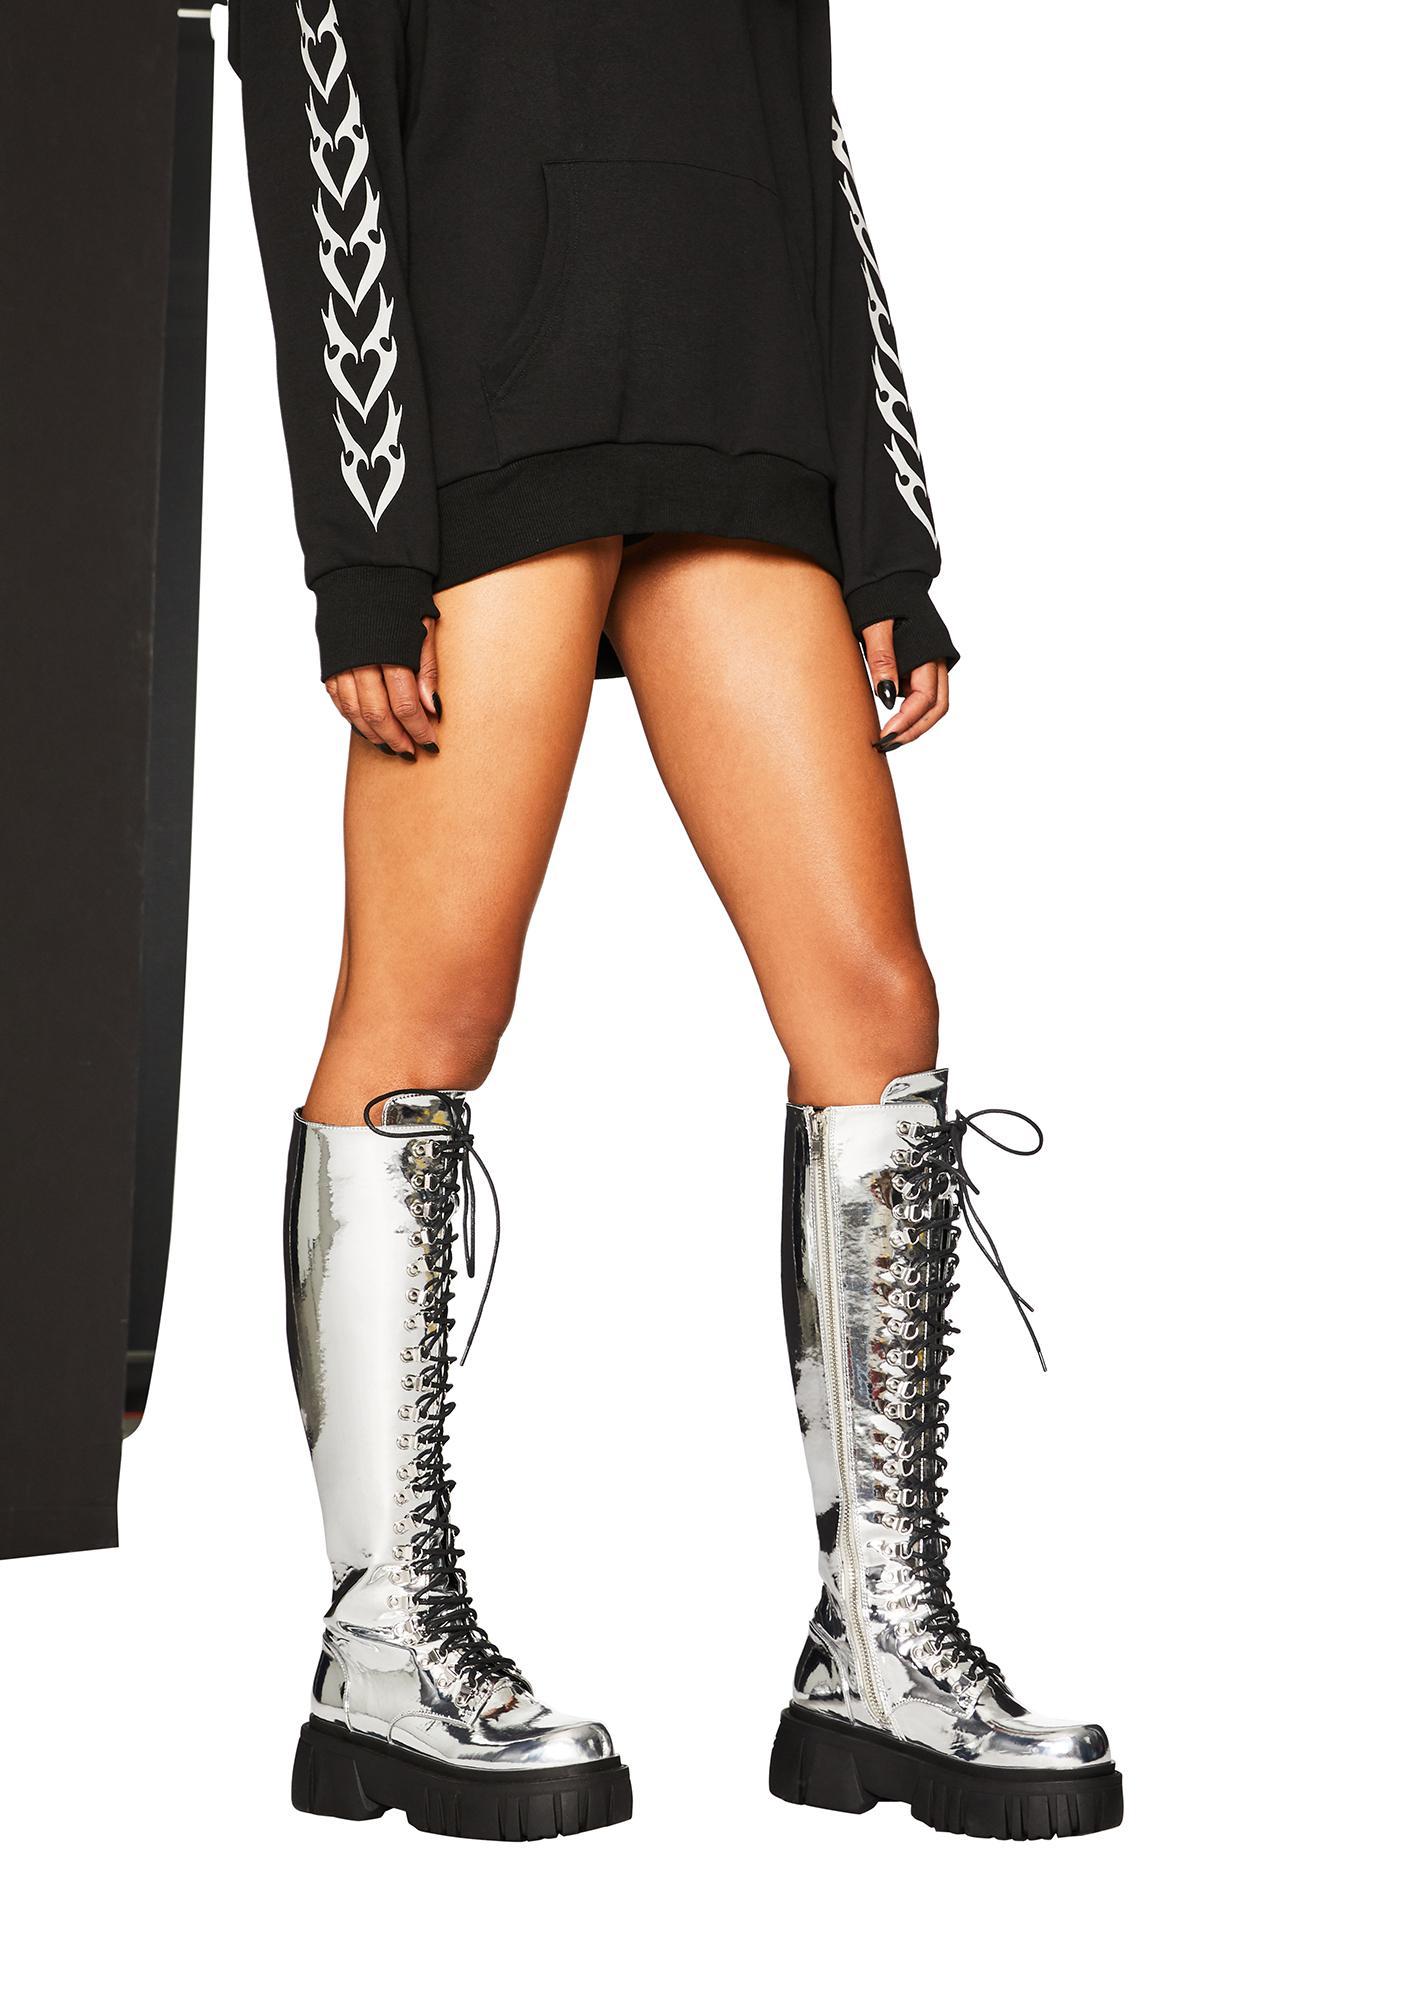 Club Exx Cosmic Ray Combat Boots